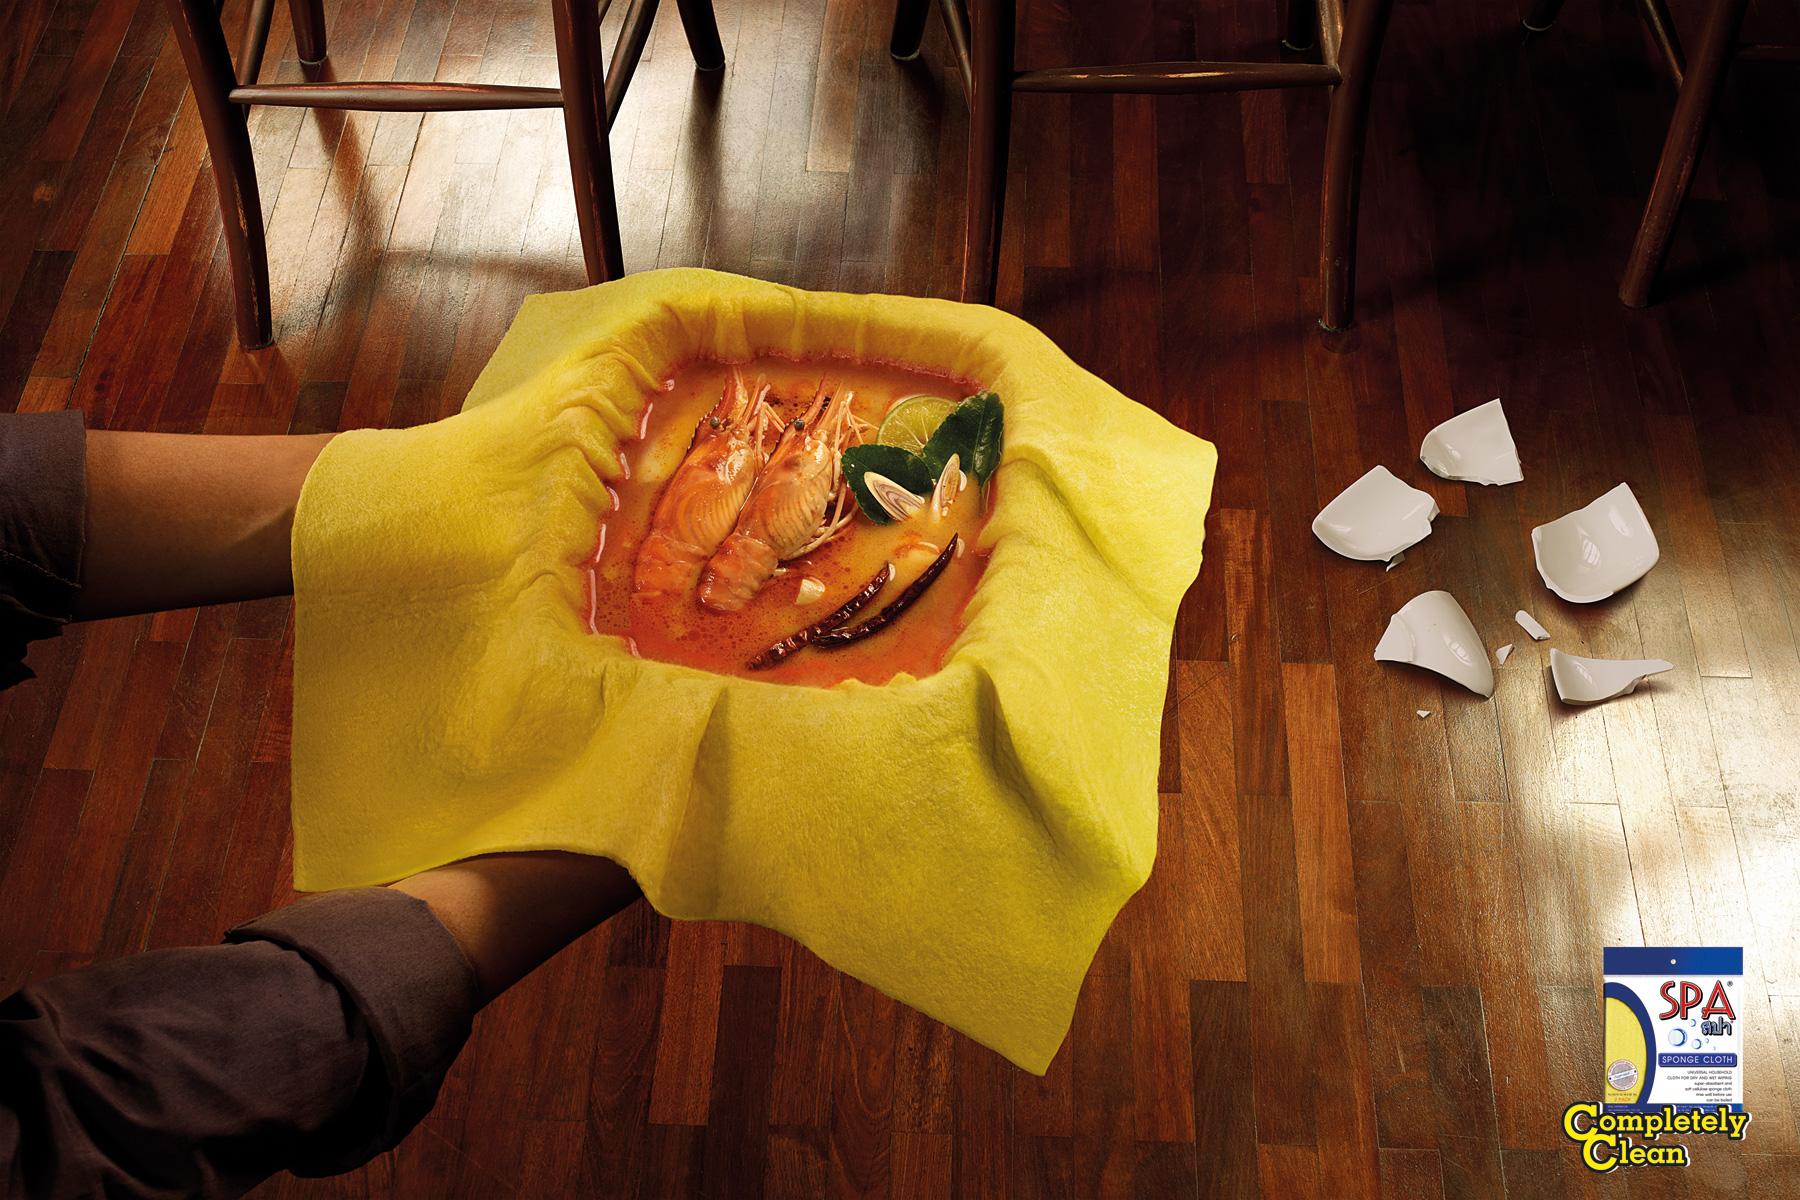 spa-cponge-cloth-tomyumkung-coffee-soup-print-351848-adeevee